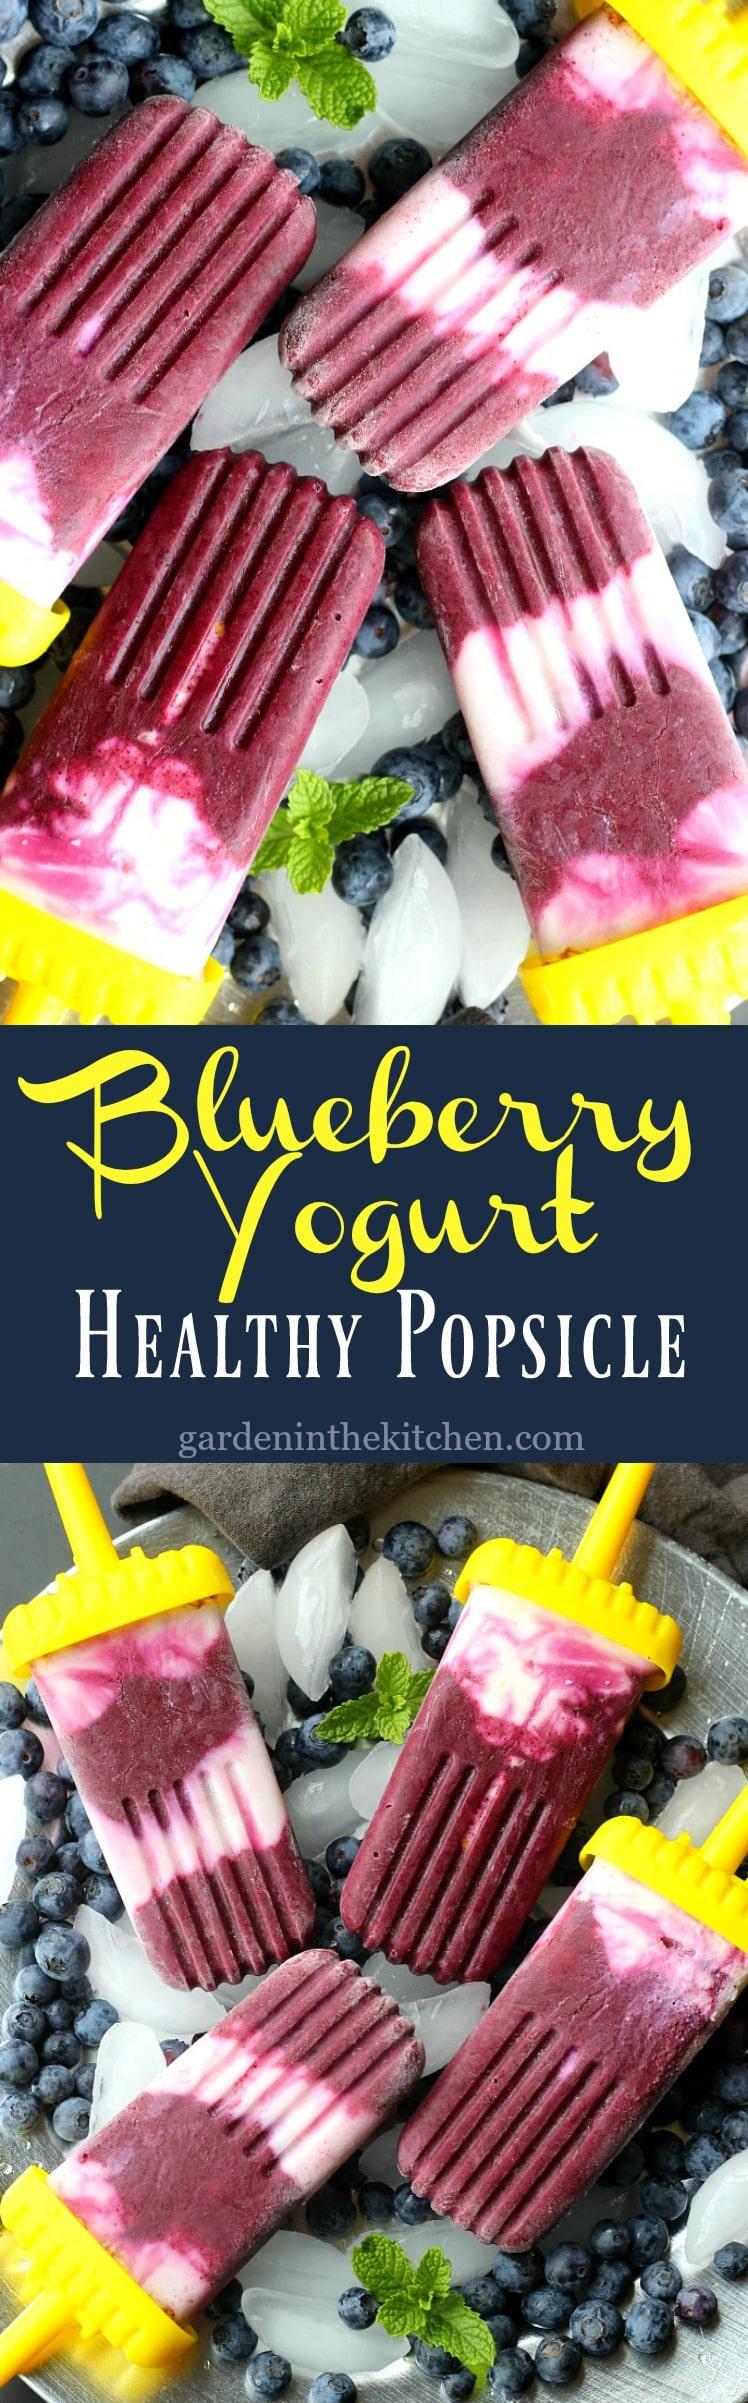 Blueberry Yogurt Healthy Popsicle